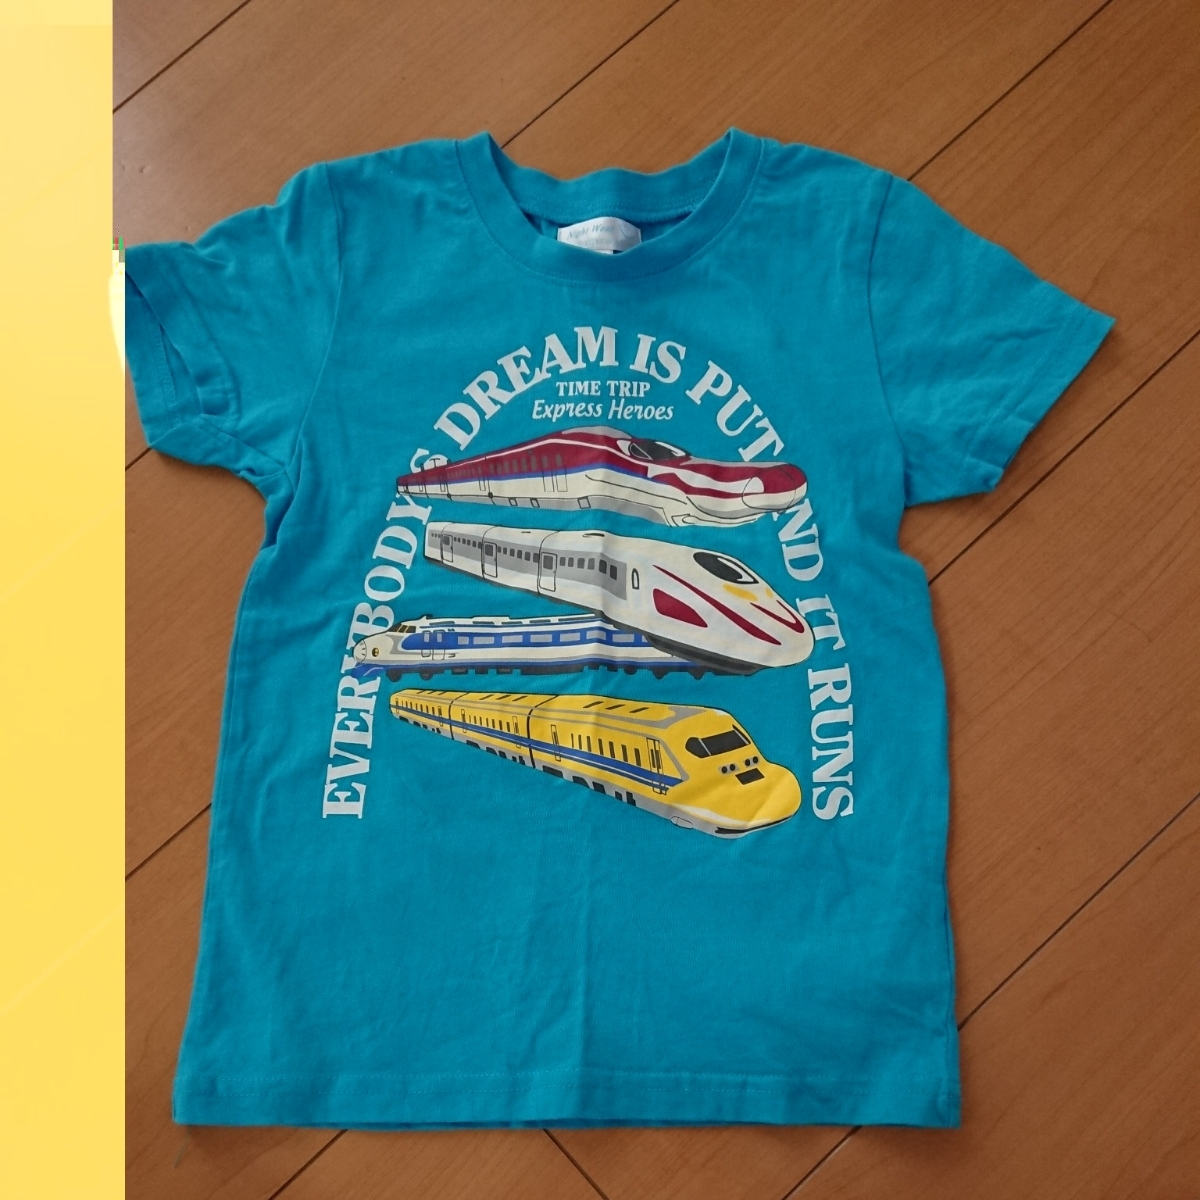 30561ae0eb9fd 代購代標第一品牌- 樂淘letao - マザウェイズmotherways子供キッズ半袖Tシャツ130cm 7-9才新幹線青緑ブルーグリーン